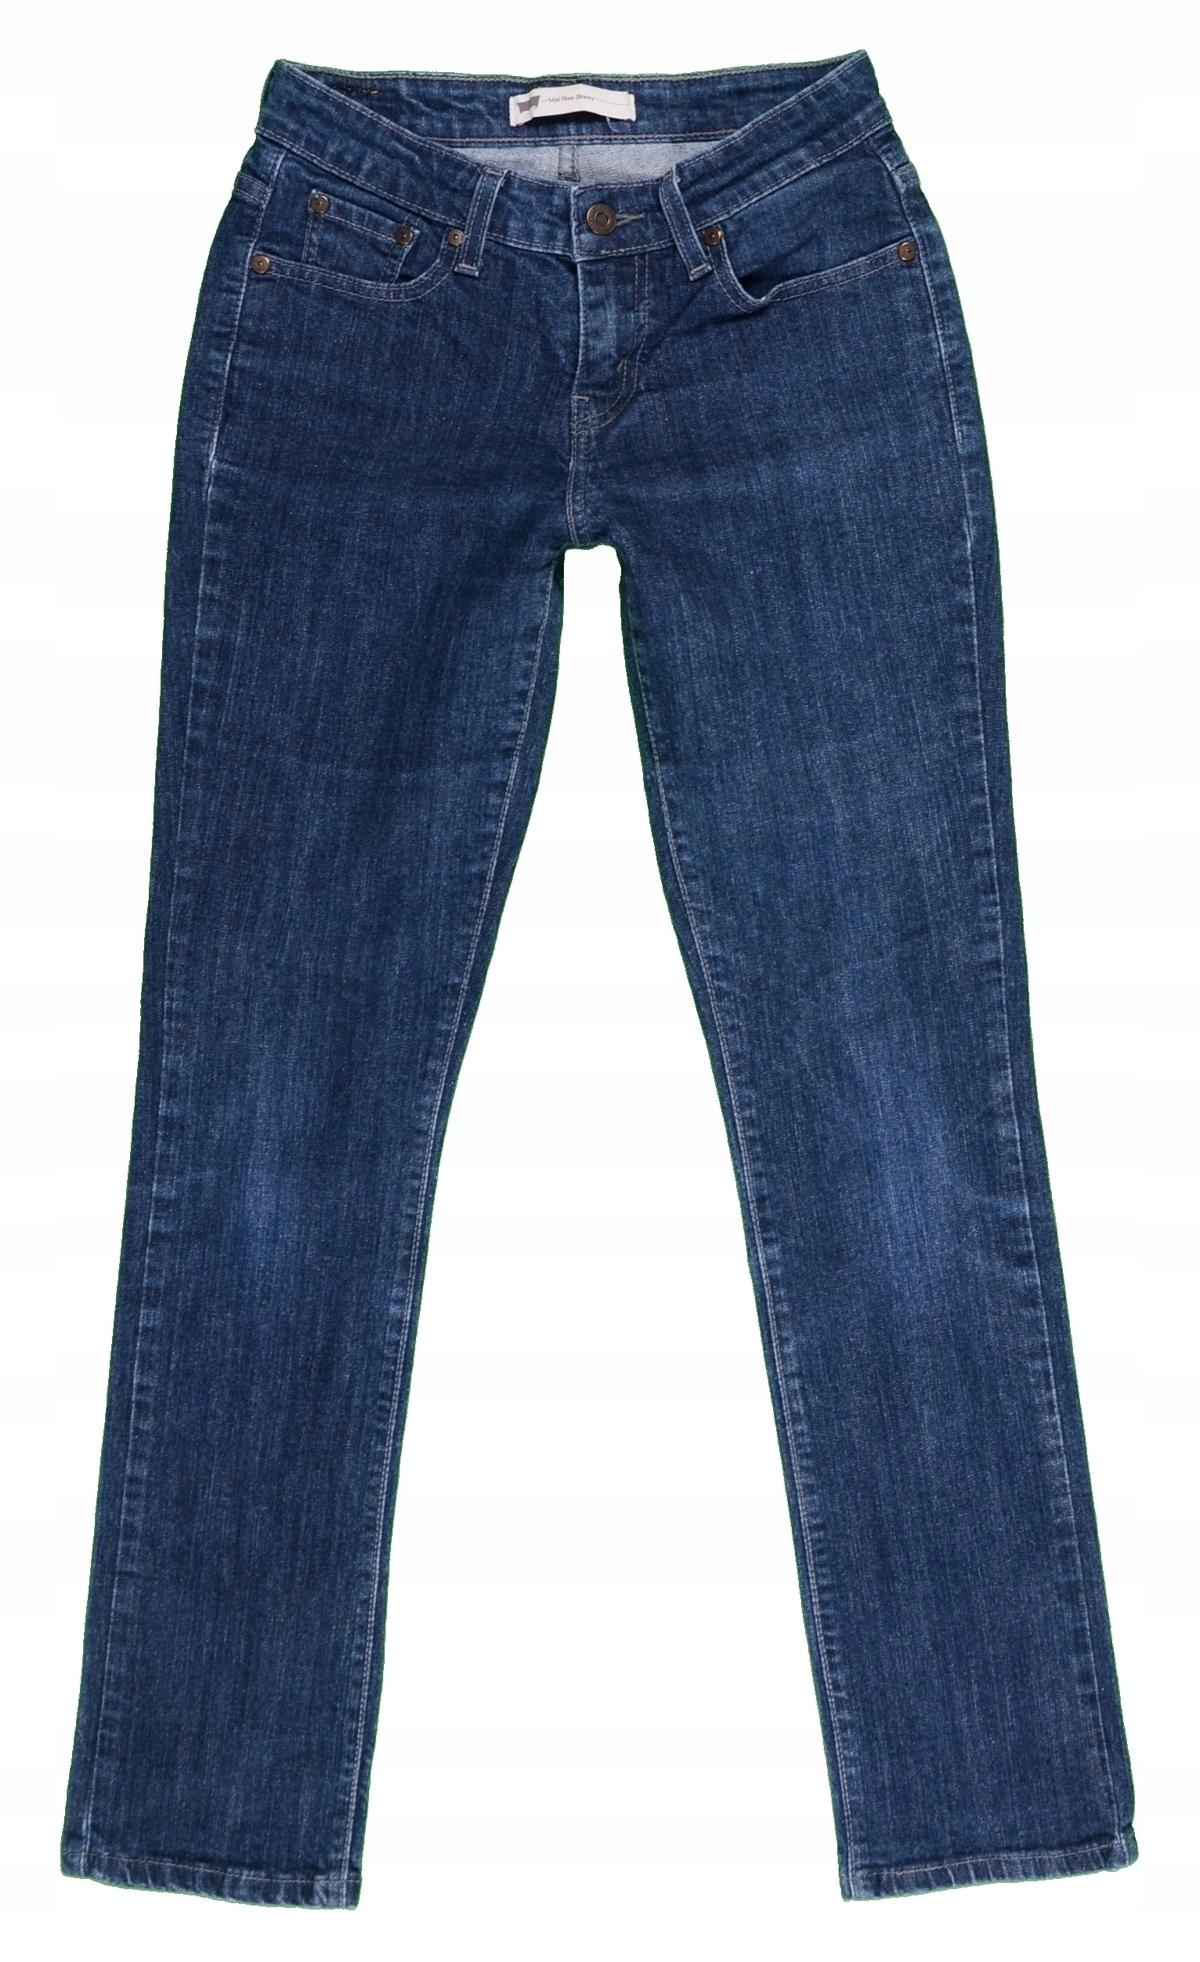 5e02042e LEVI'S jeansy damskie MID RISE SKINNY r. 36 MISIZM - 7544549898 ...